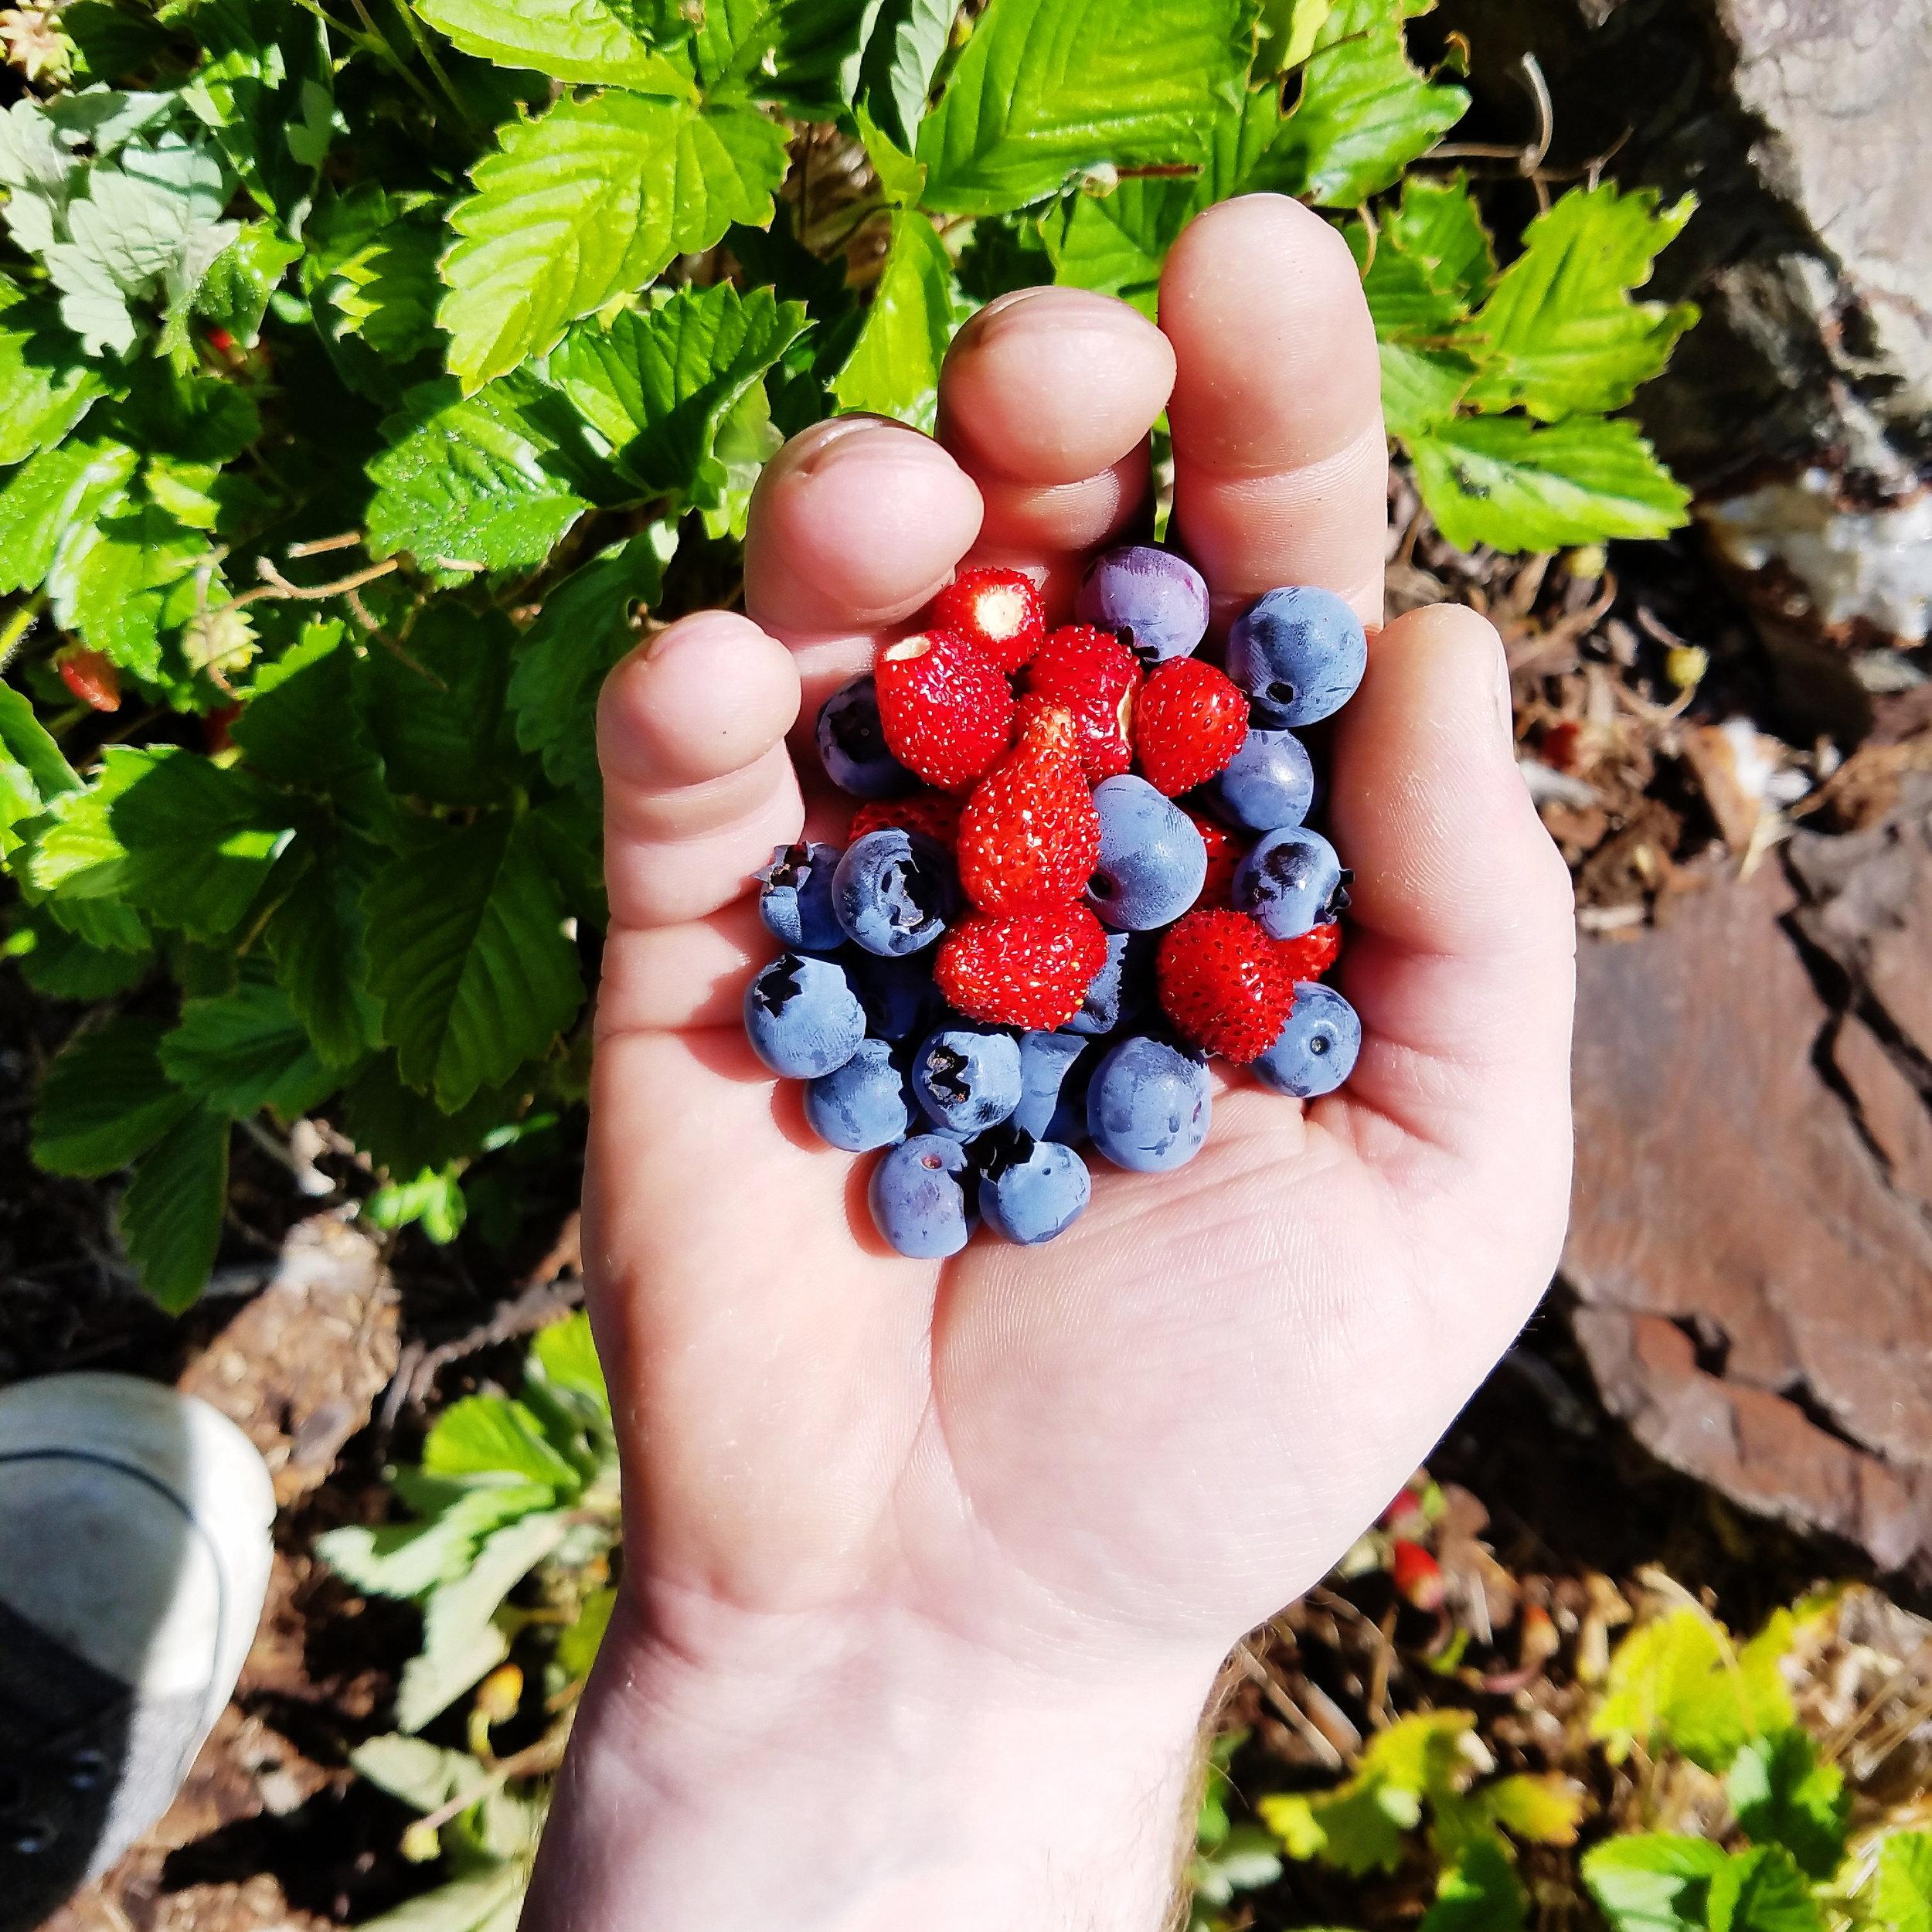 Berries in my parents yard!